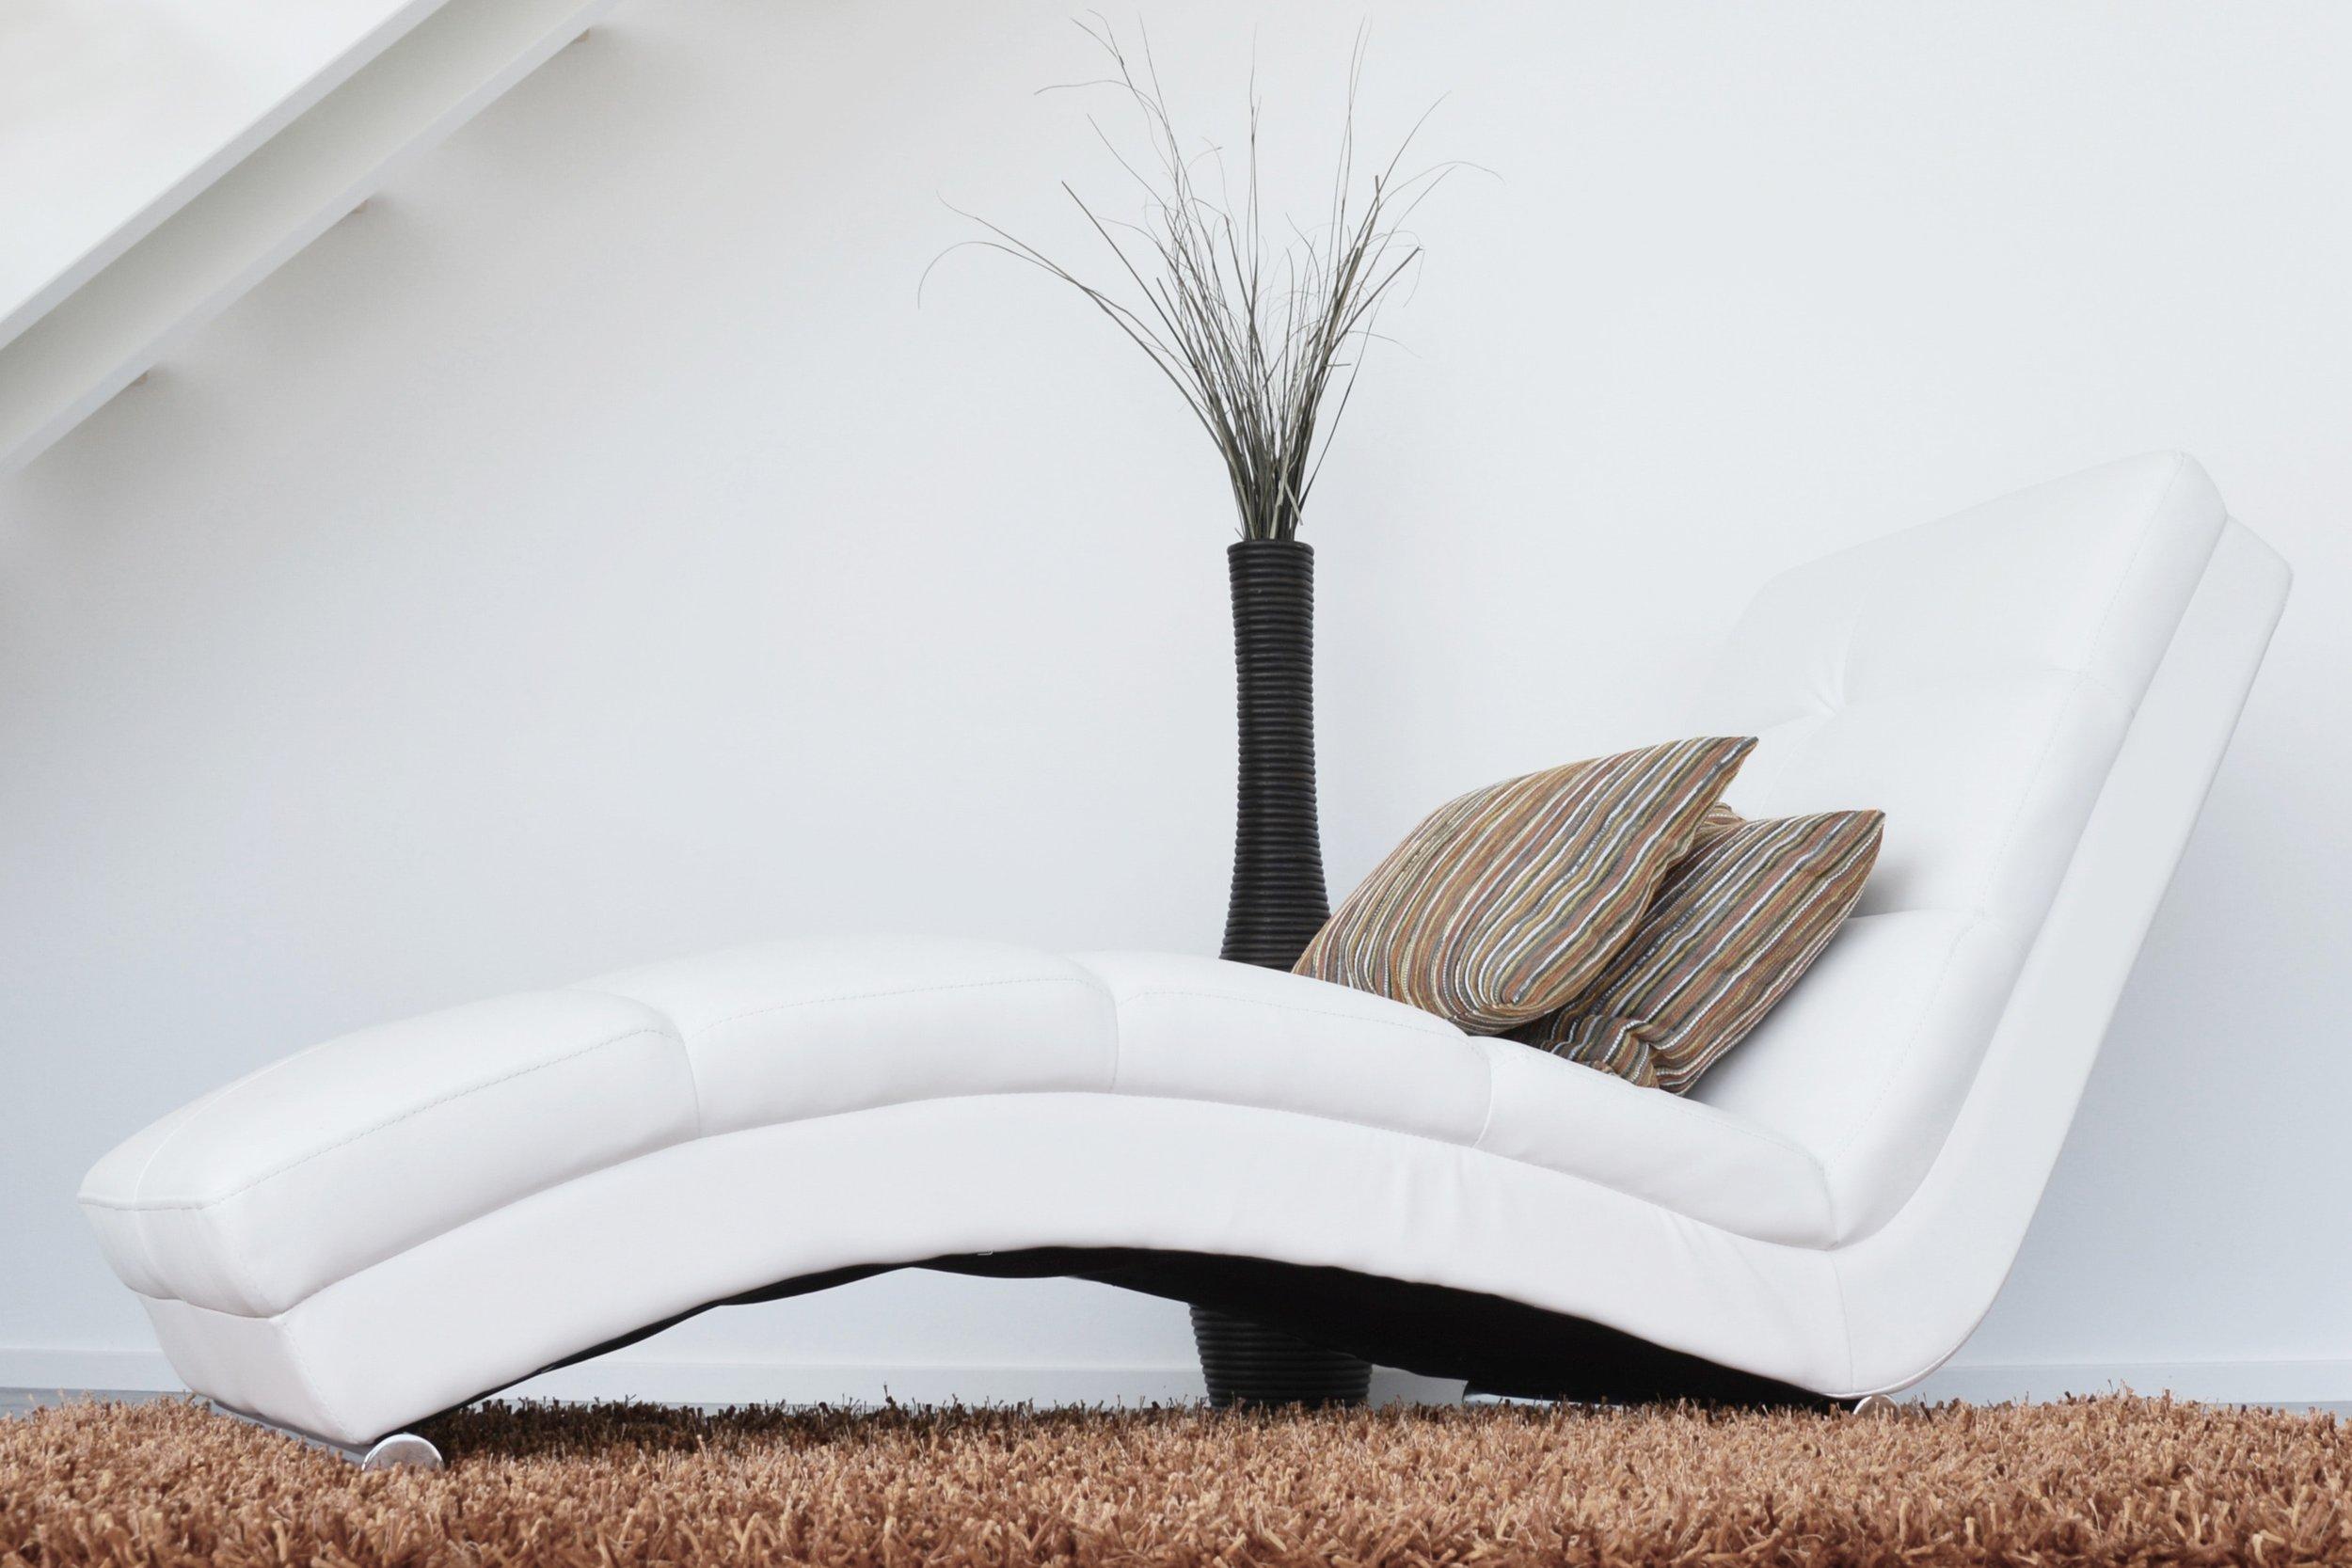 architecture-carpet-chair-276534.jpg